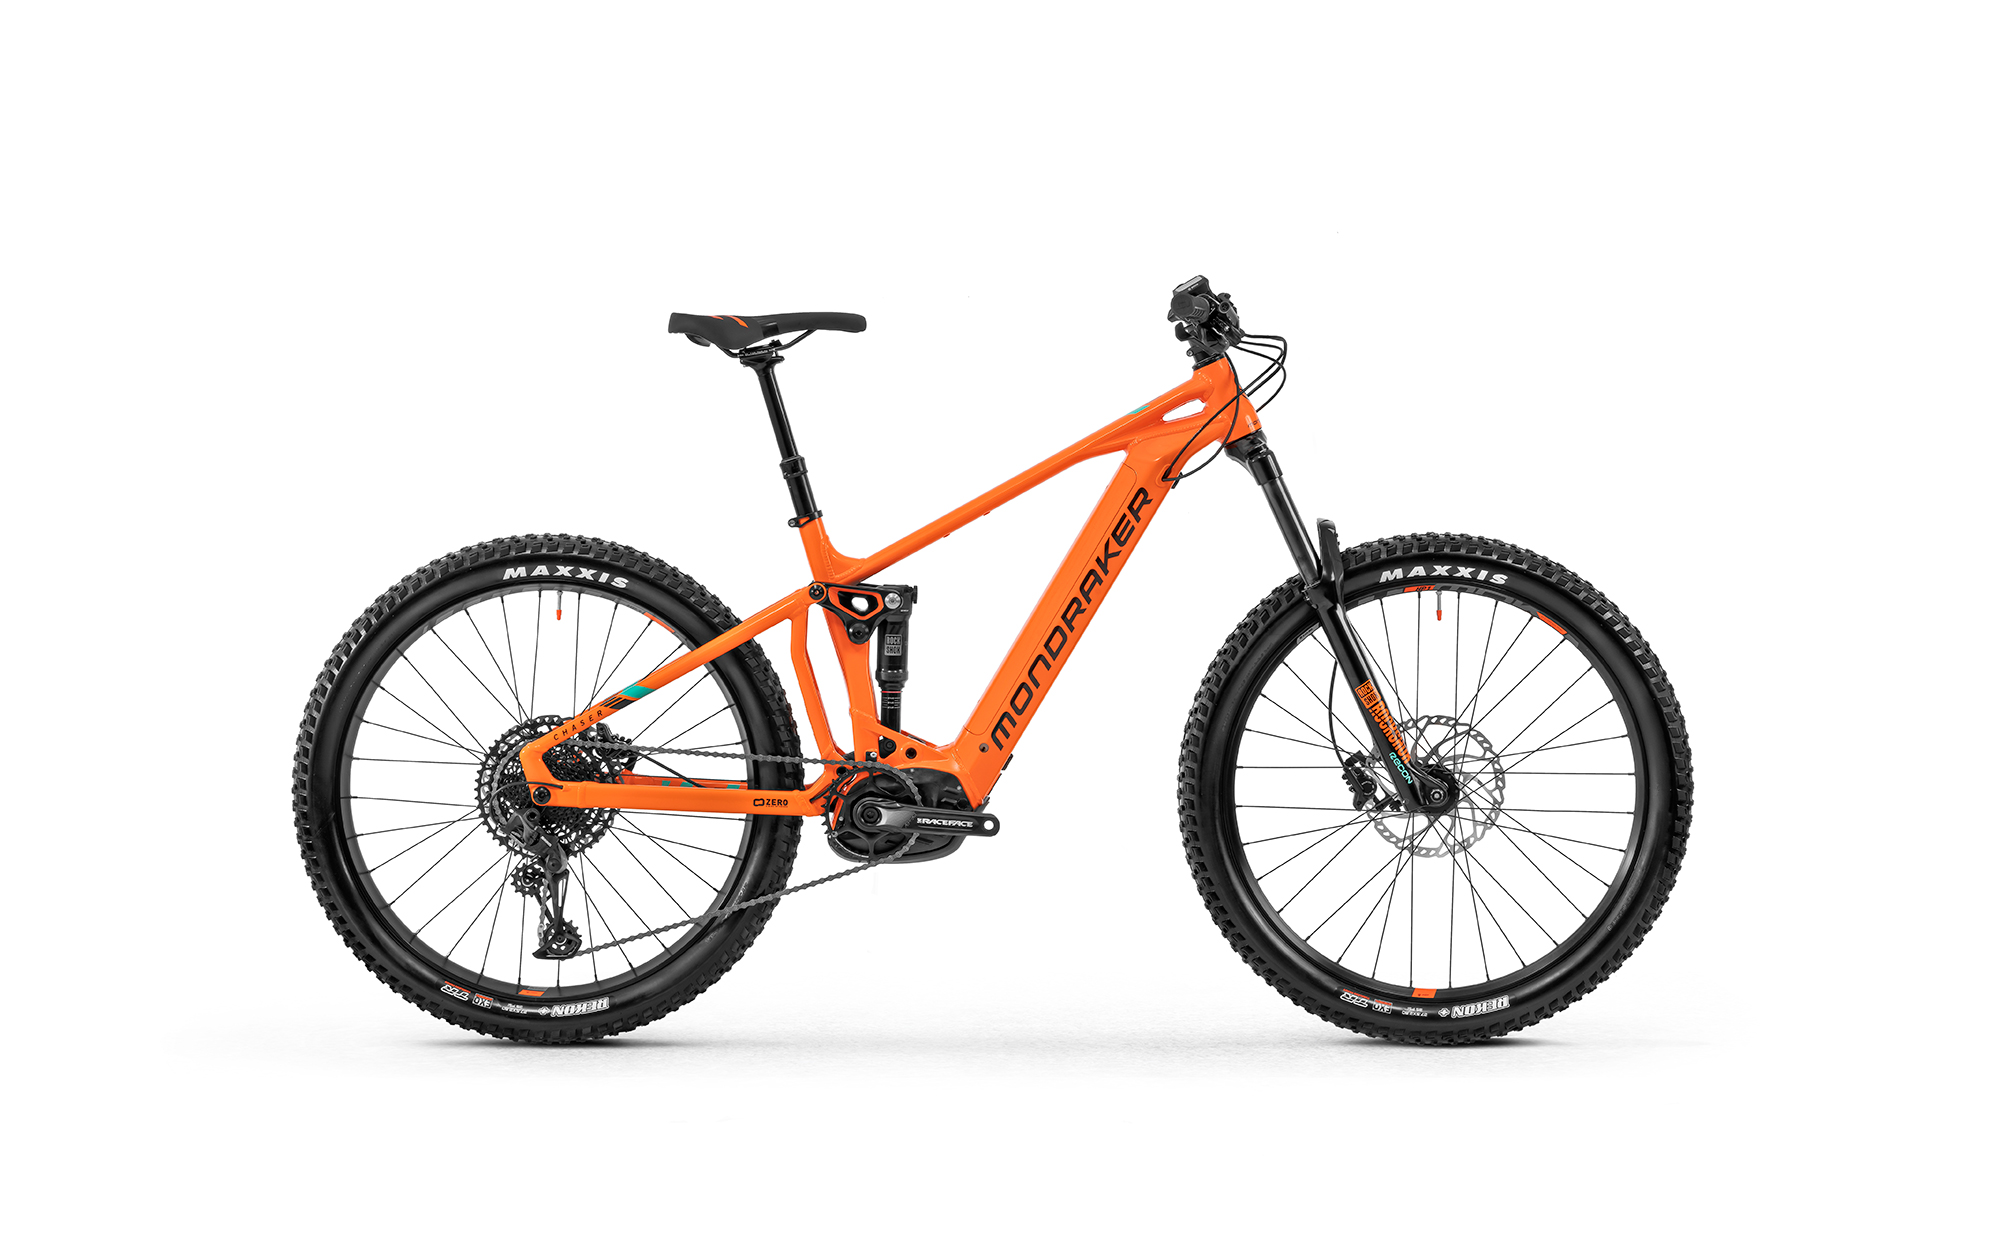 bici elettrica Chaser+ Mondraker